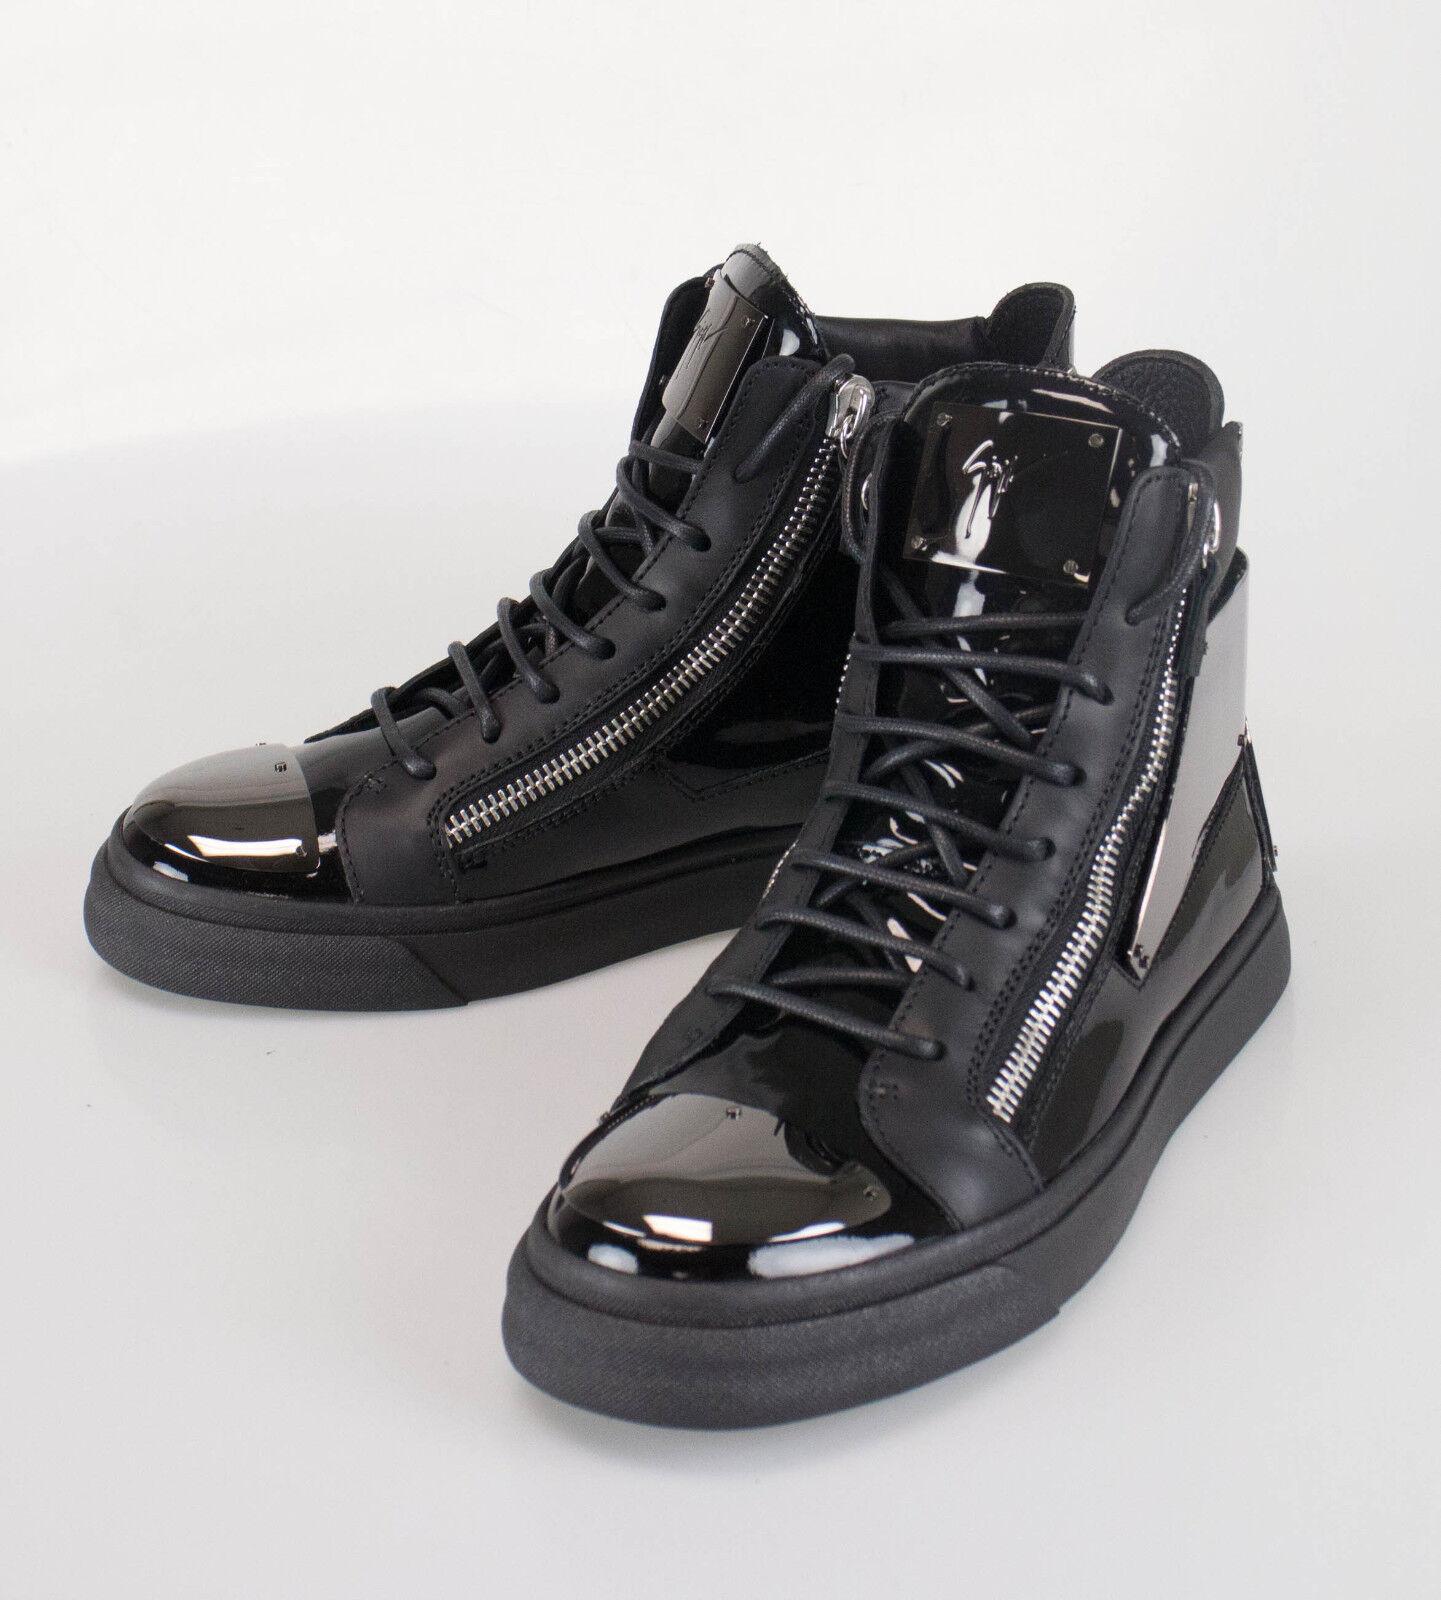 New. GIUSEPPE ZANOTTI London Vernice Hi-Top Sneakers shoes 7 US 40 EU